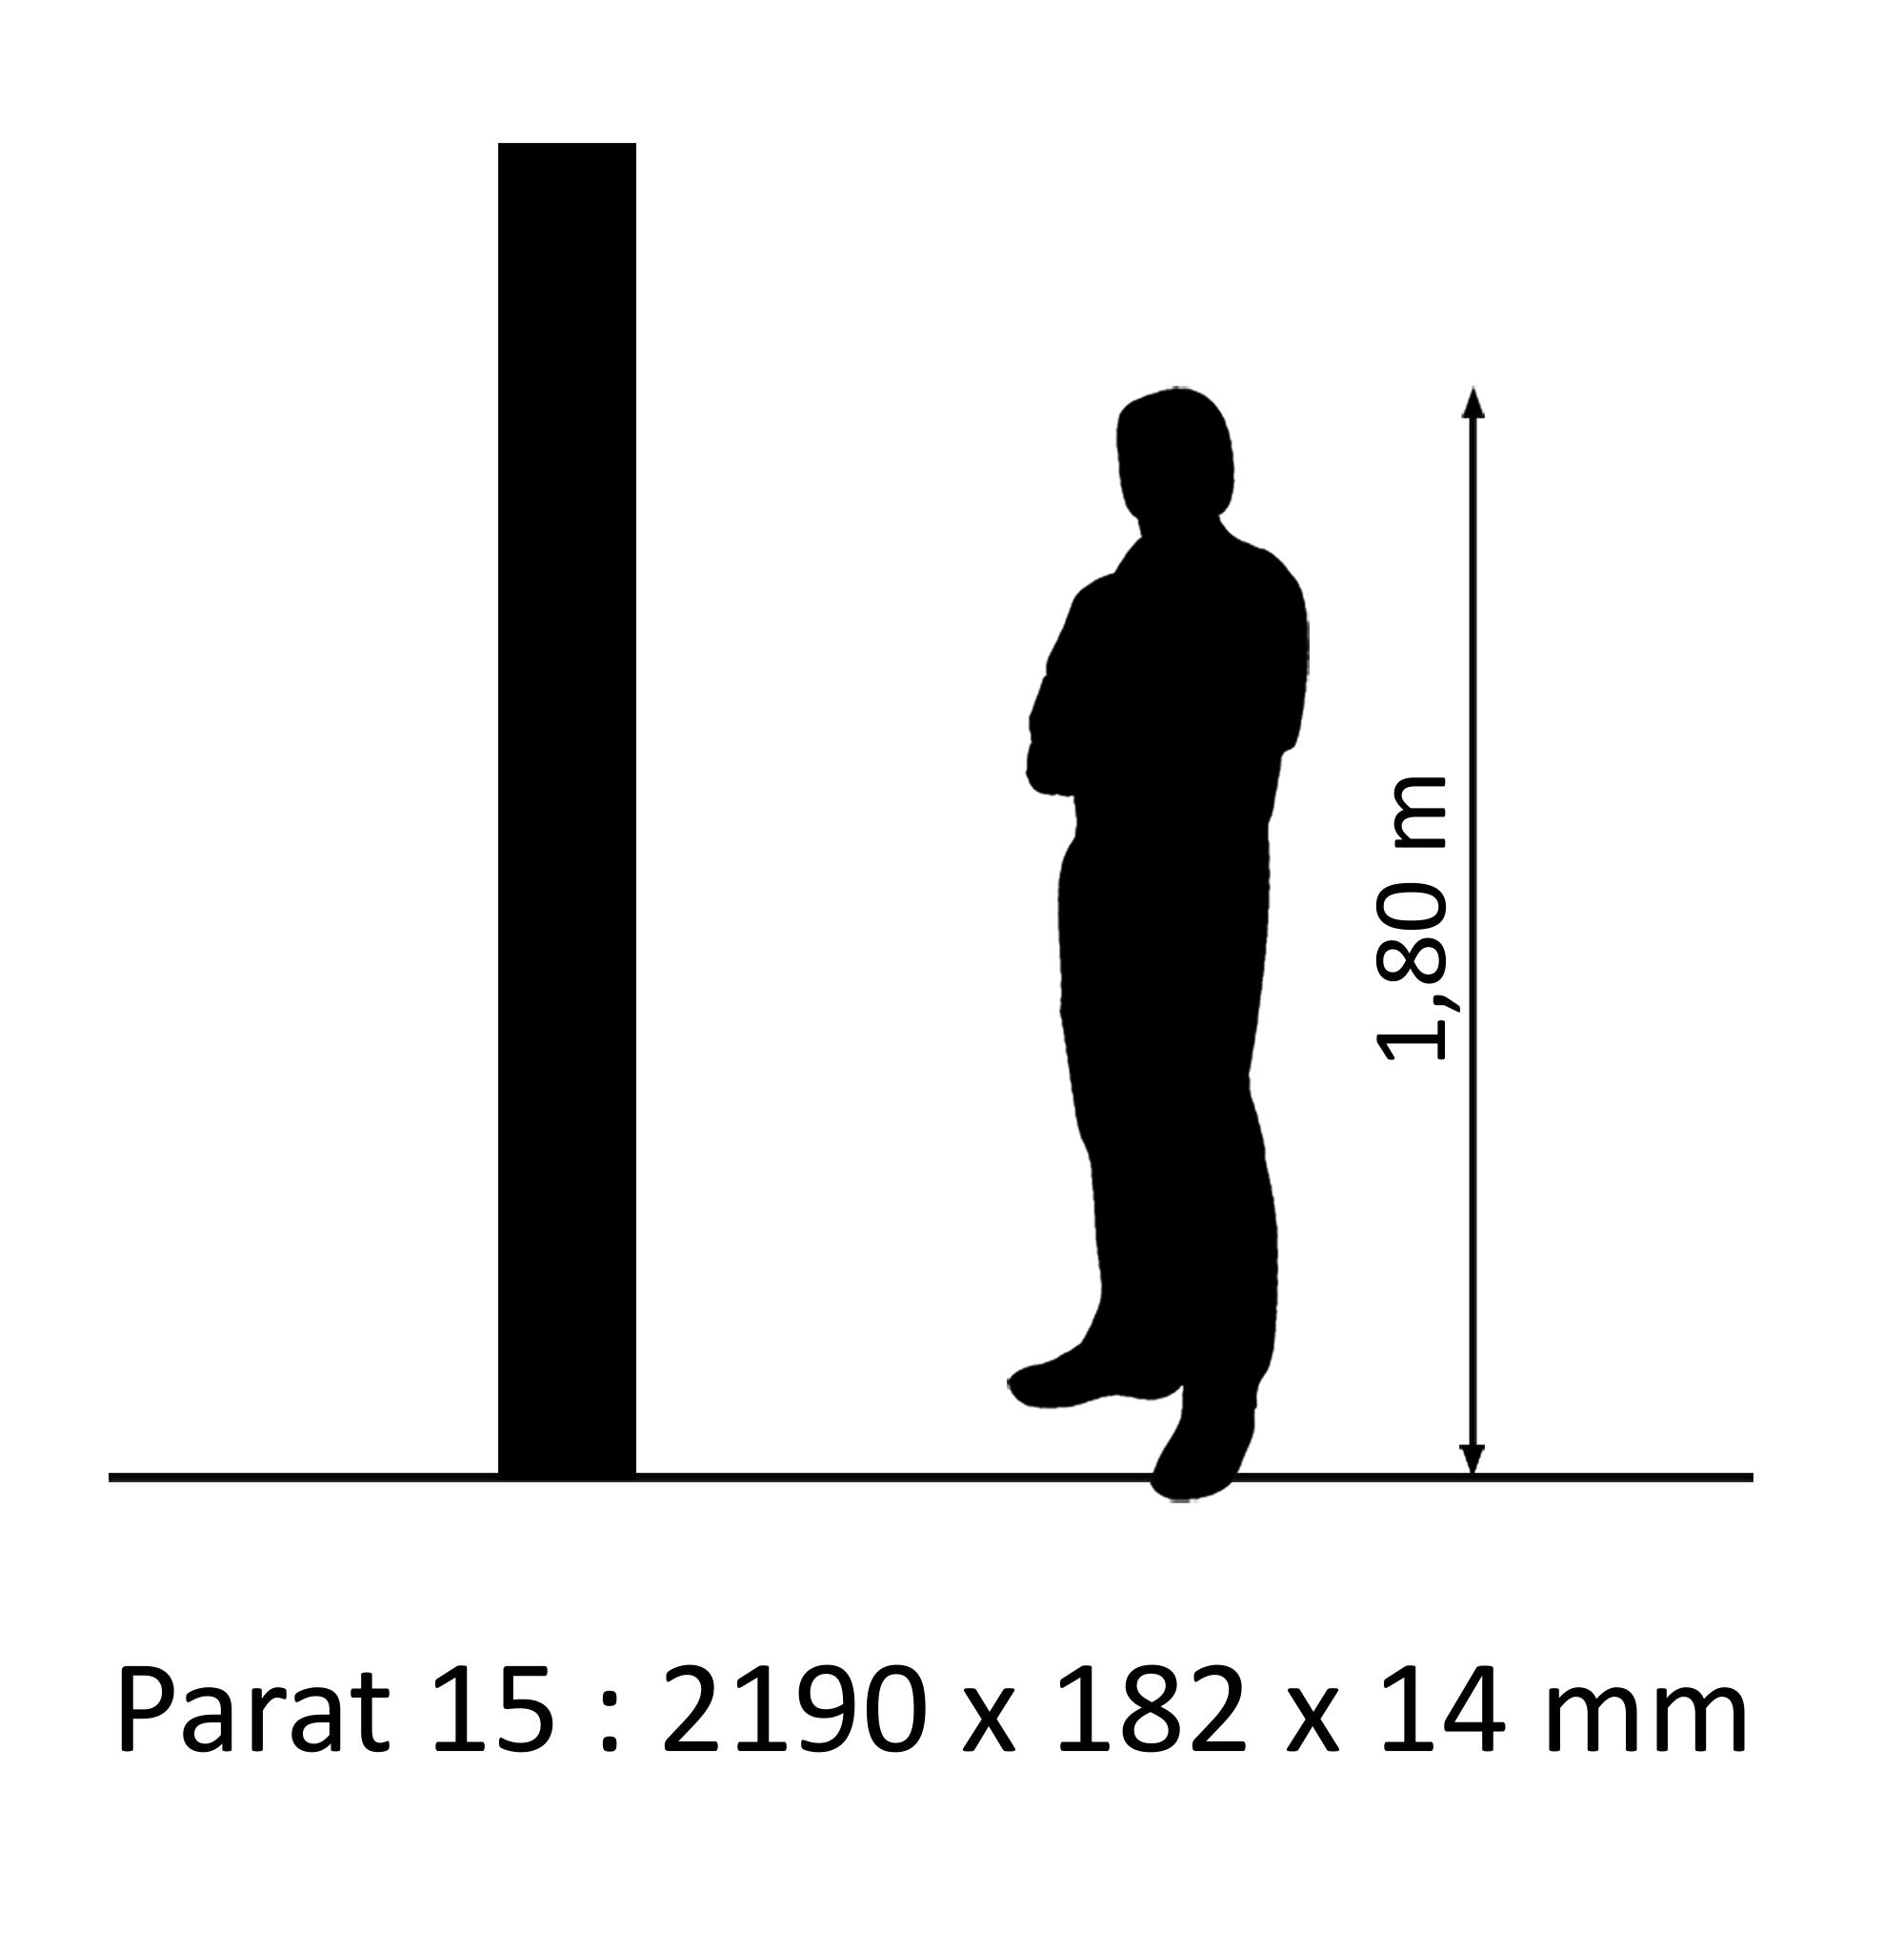 PARAT 15 Merbau Trend 3-strip Loc5G